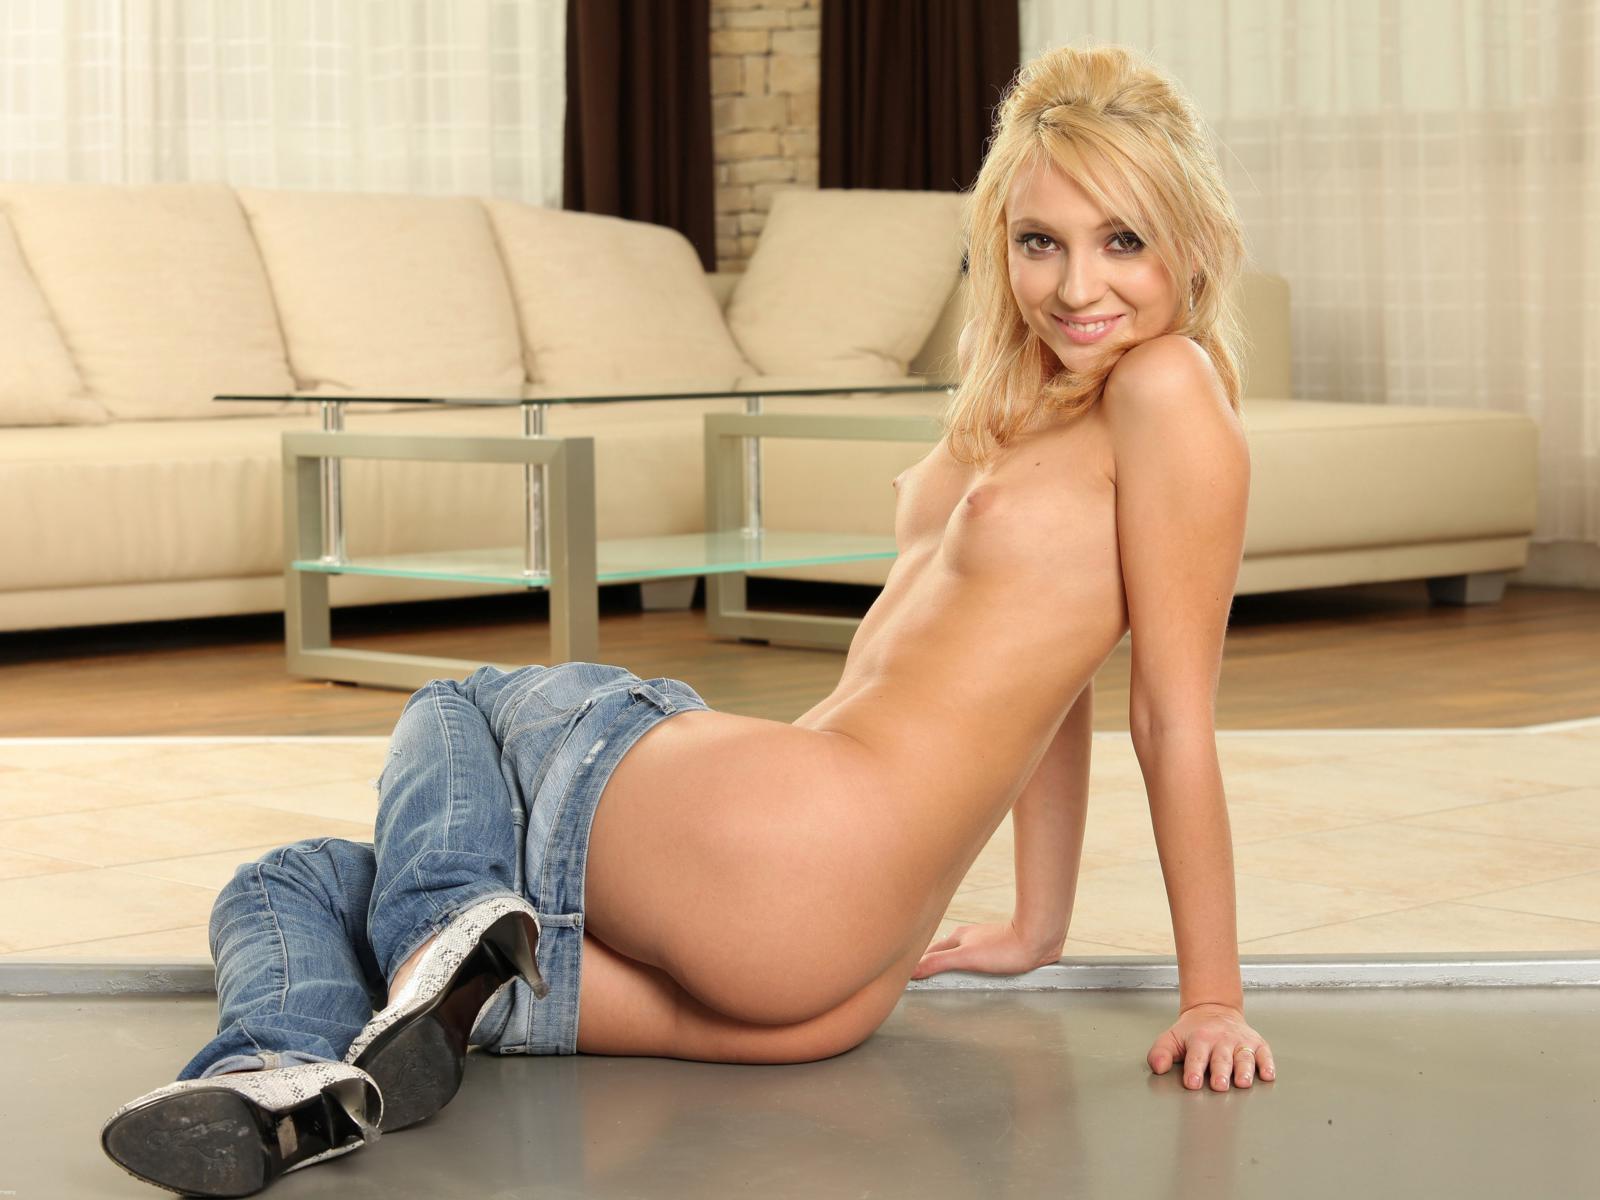 Nude skinny teen ass